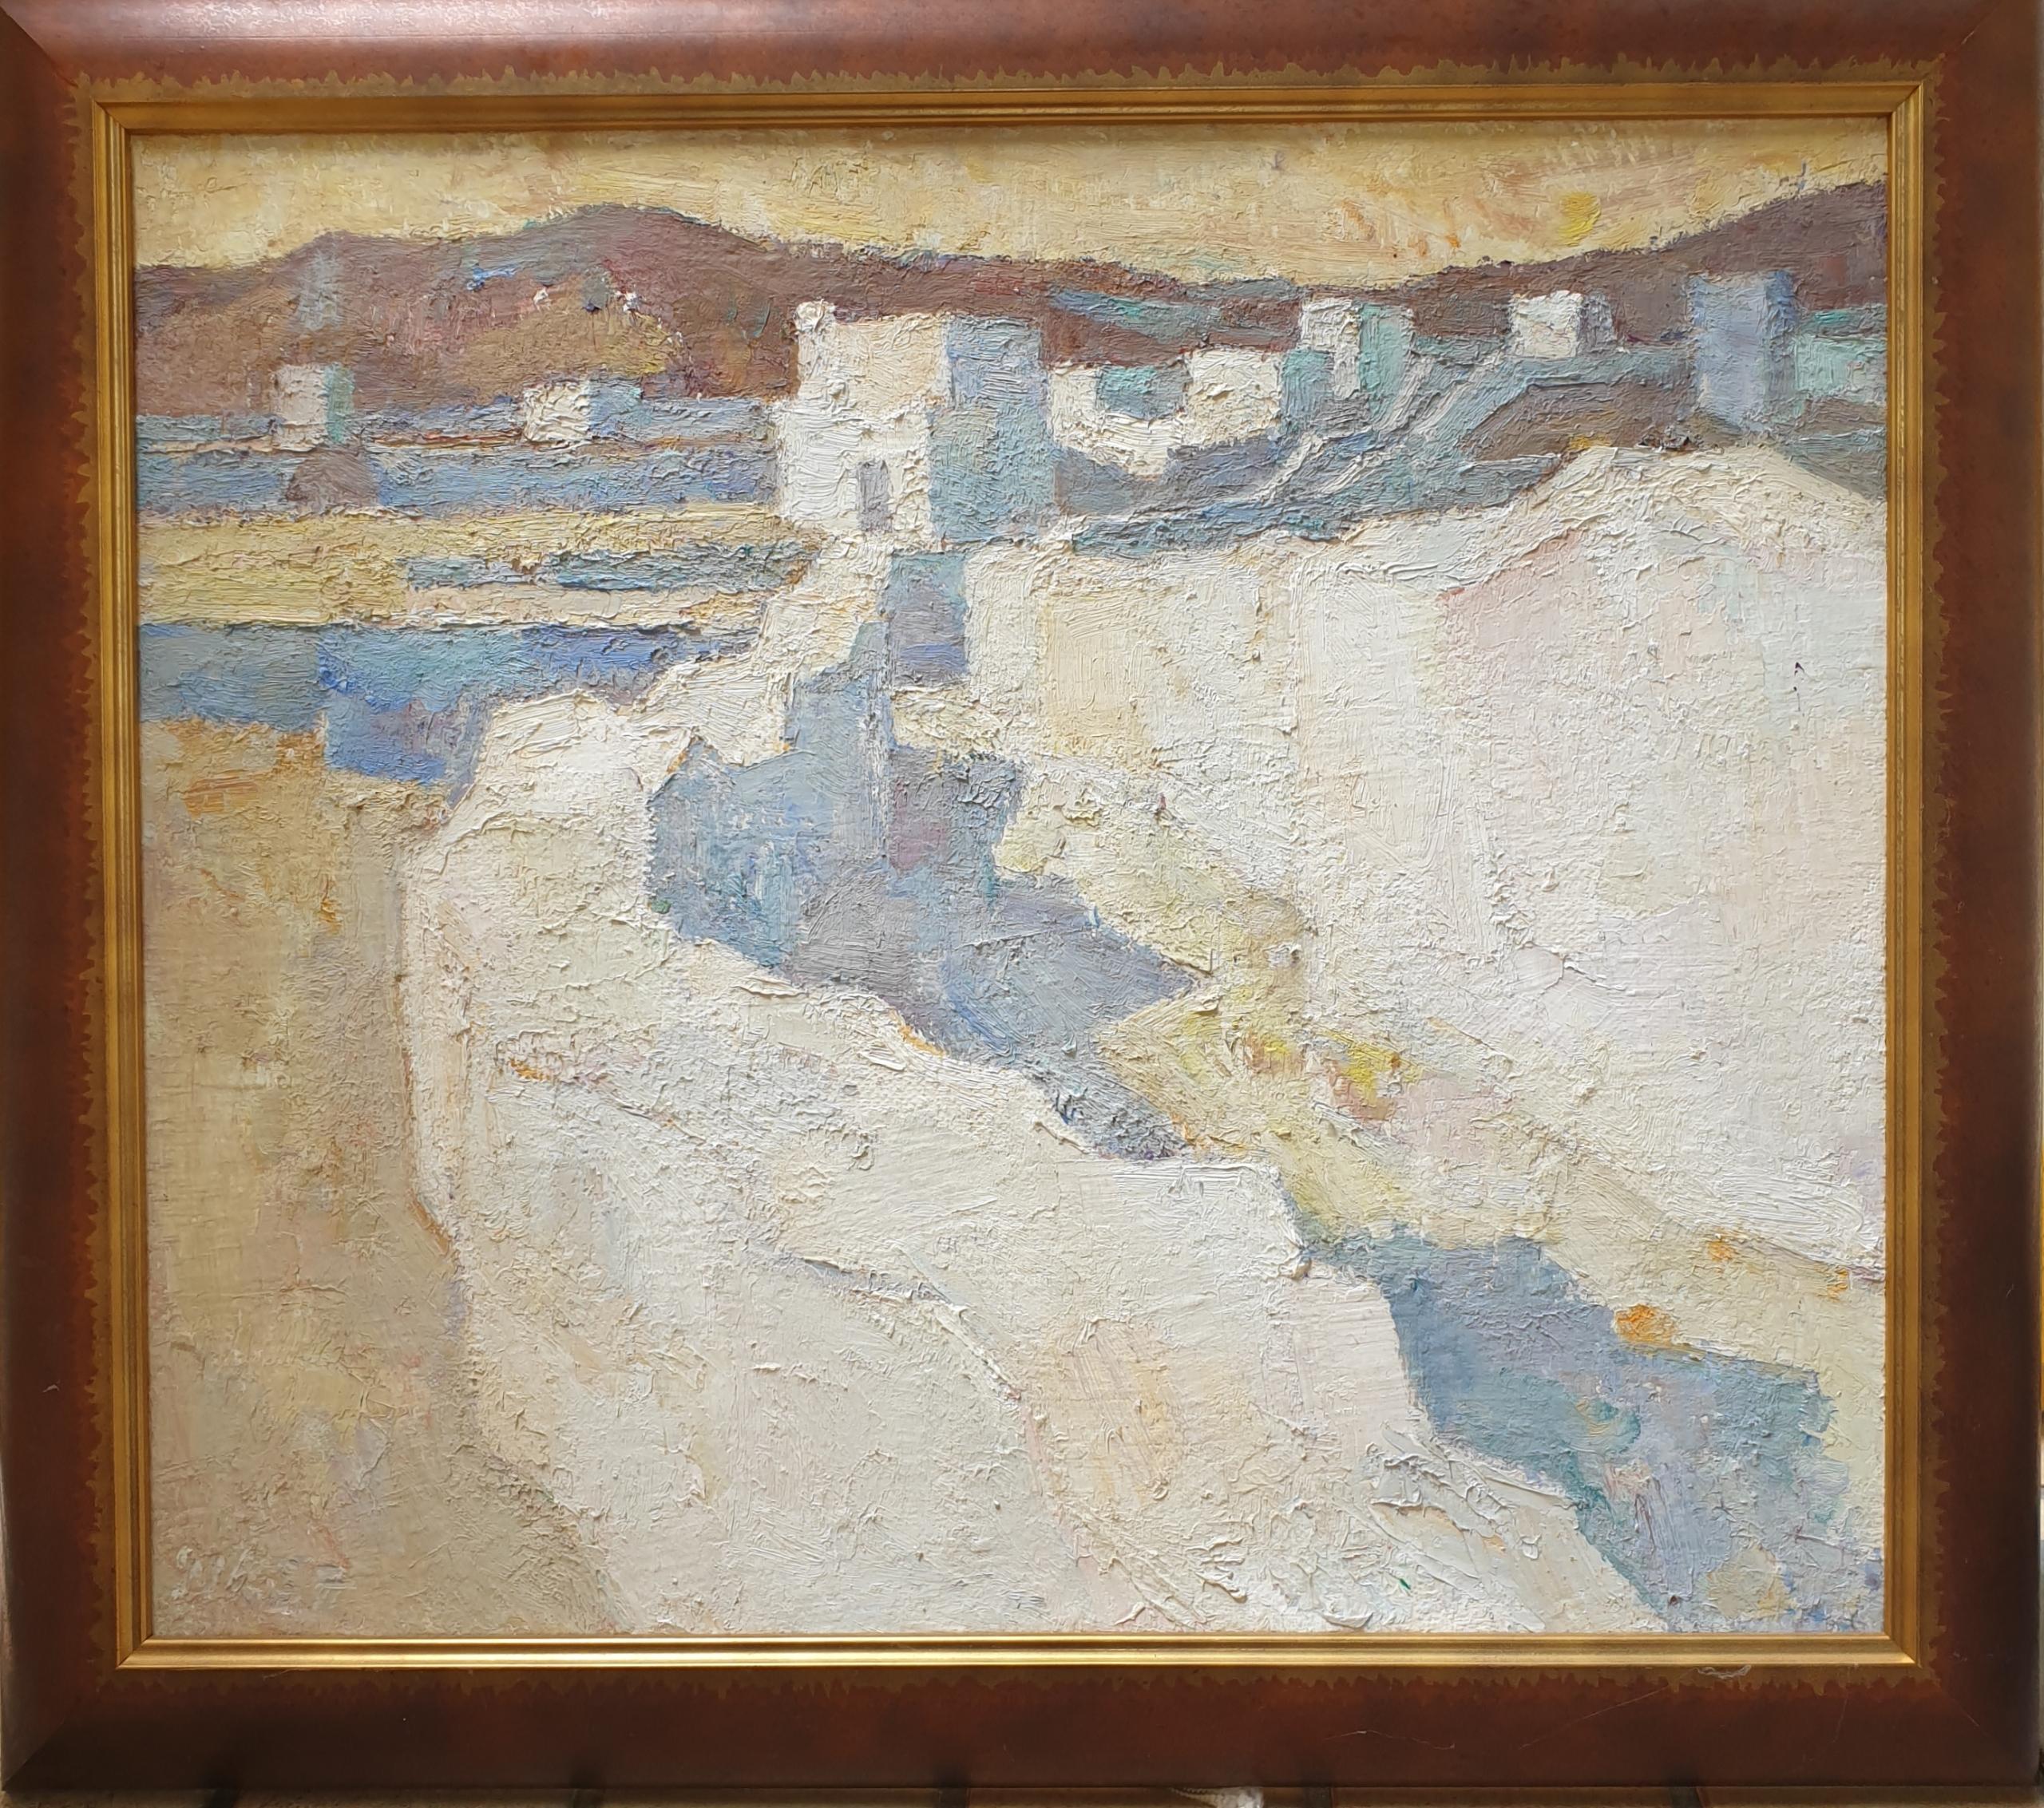 Abendlandschaft auf Tinos, 1987  Öl auf Leinwand, 52 x 69 cm